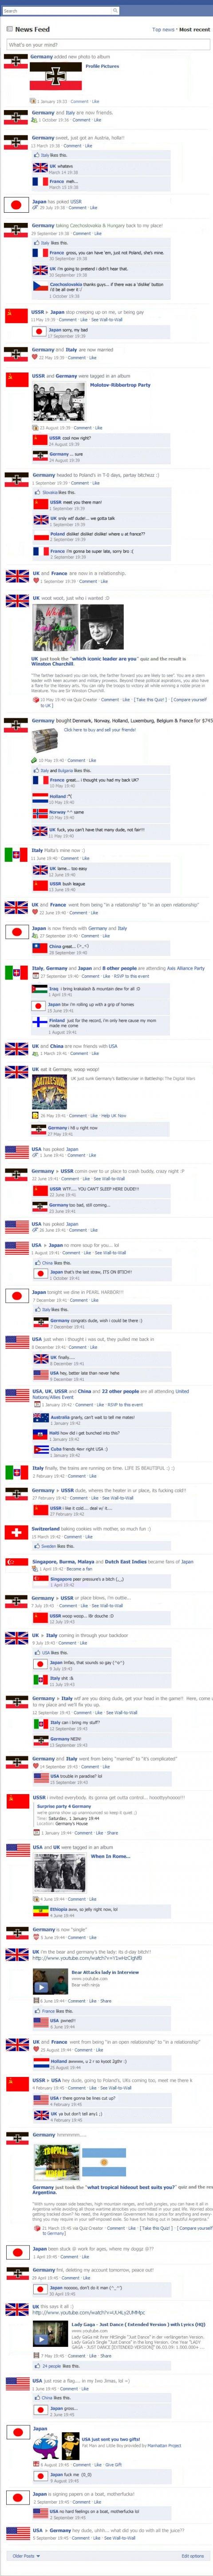 World war 2(two) on facebook, historical facebook updates